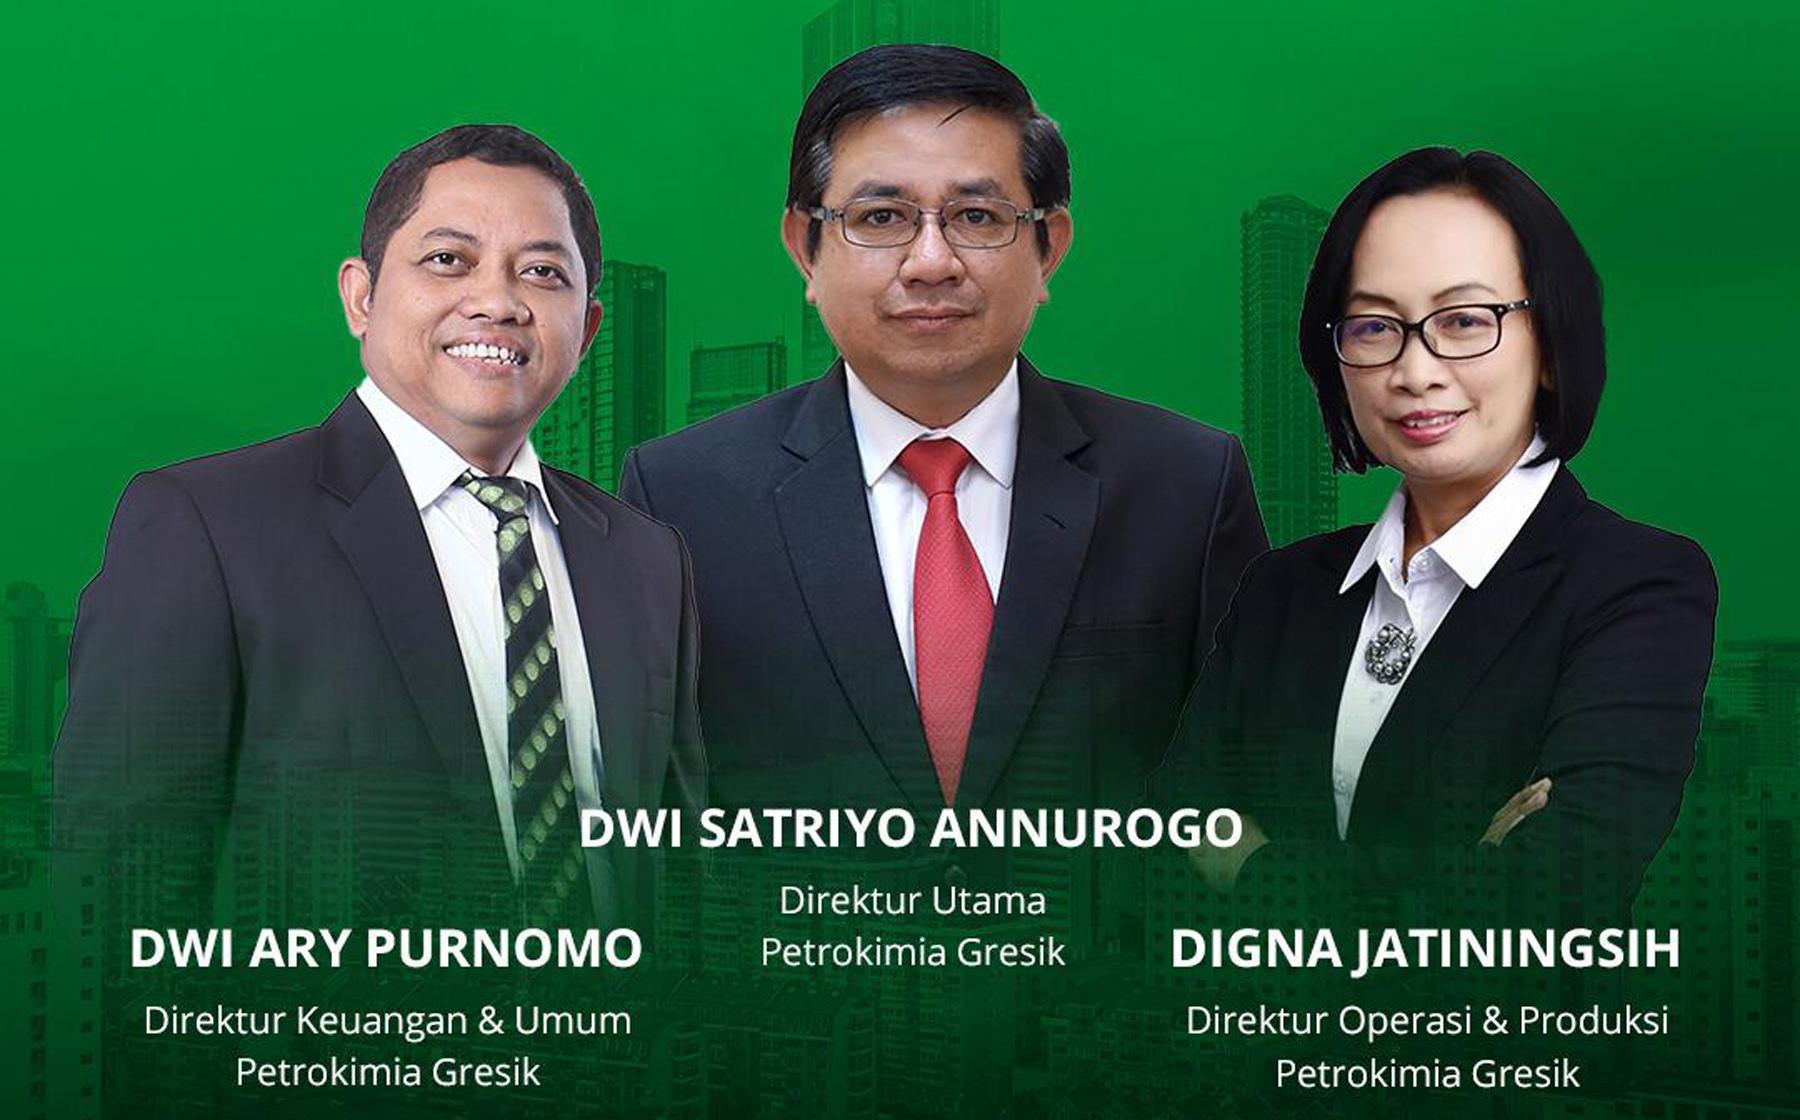 Direksi PT Petrokimia Gresik per 25 Agustus 2020.